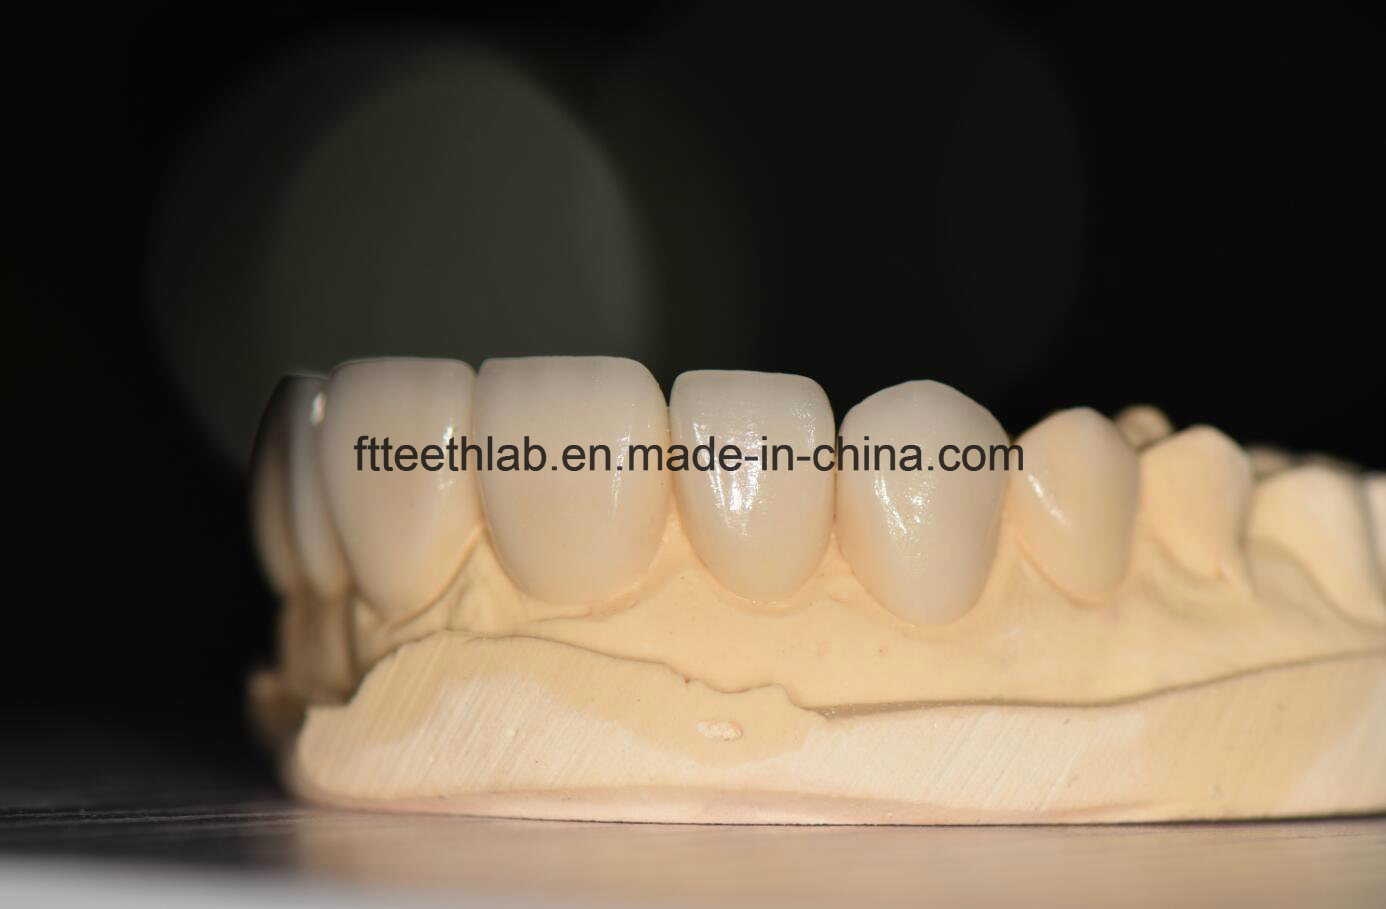 No Preparation Ultrathin Veneers Made in China Dental Lab